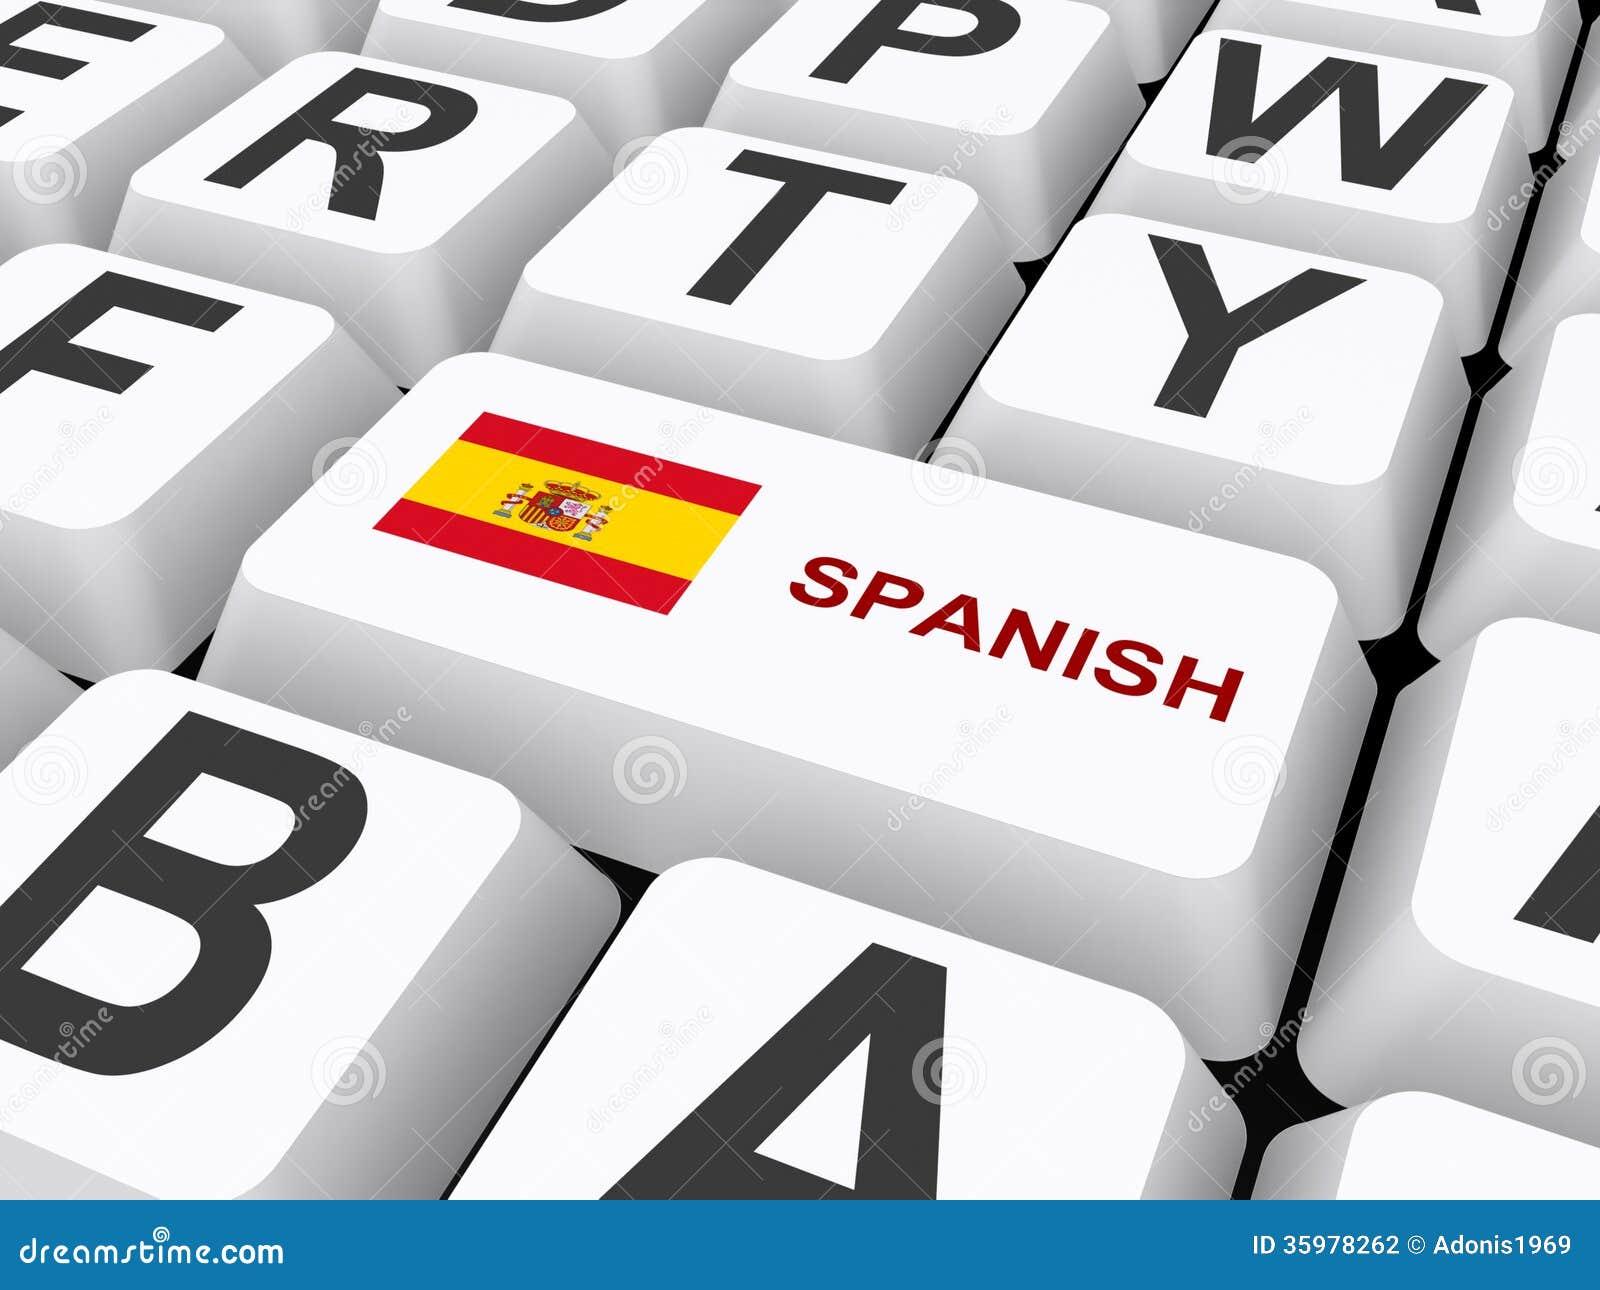 Spanish button on keyboard stock illustration illustration of download spanish button on keyboard stock illustration illustration of letters 35978262 spiritdancerdesigns Images